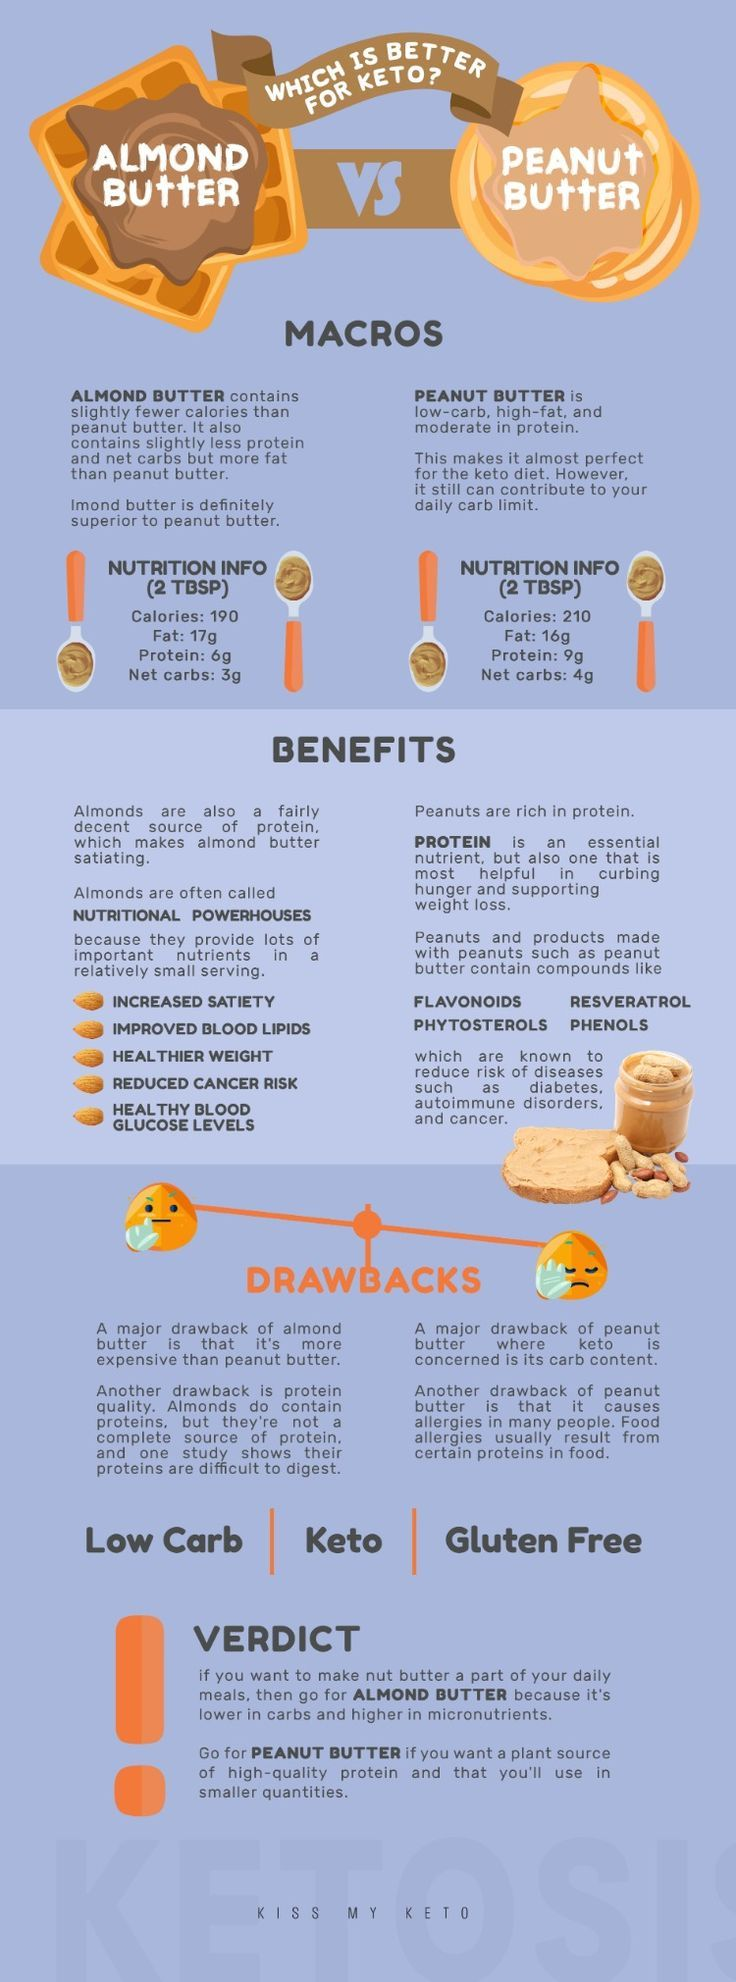 Almond Butter vs. Peanut Butter: What's Best for Keto